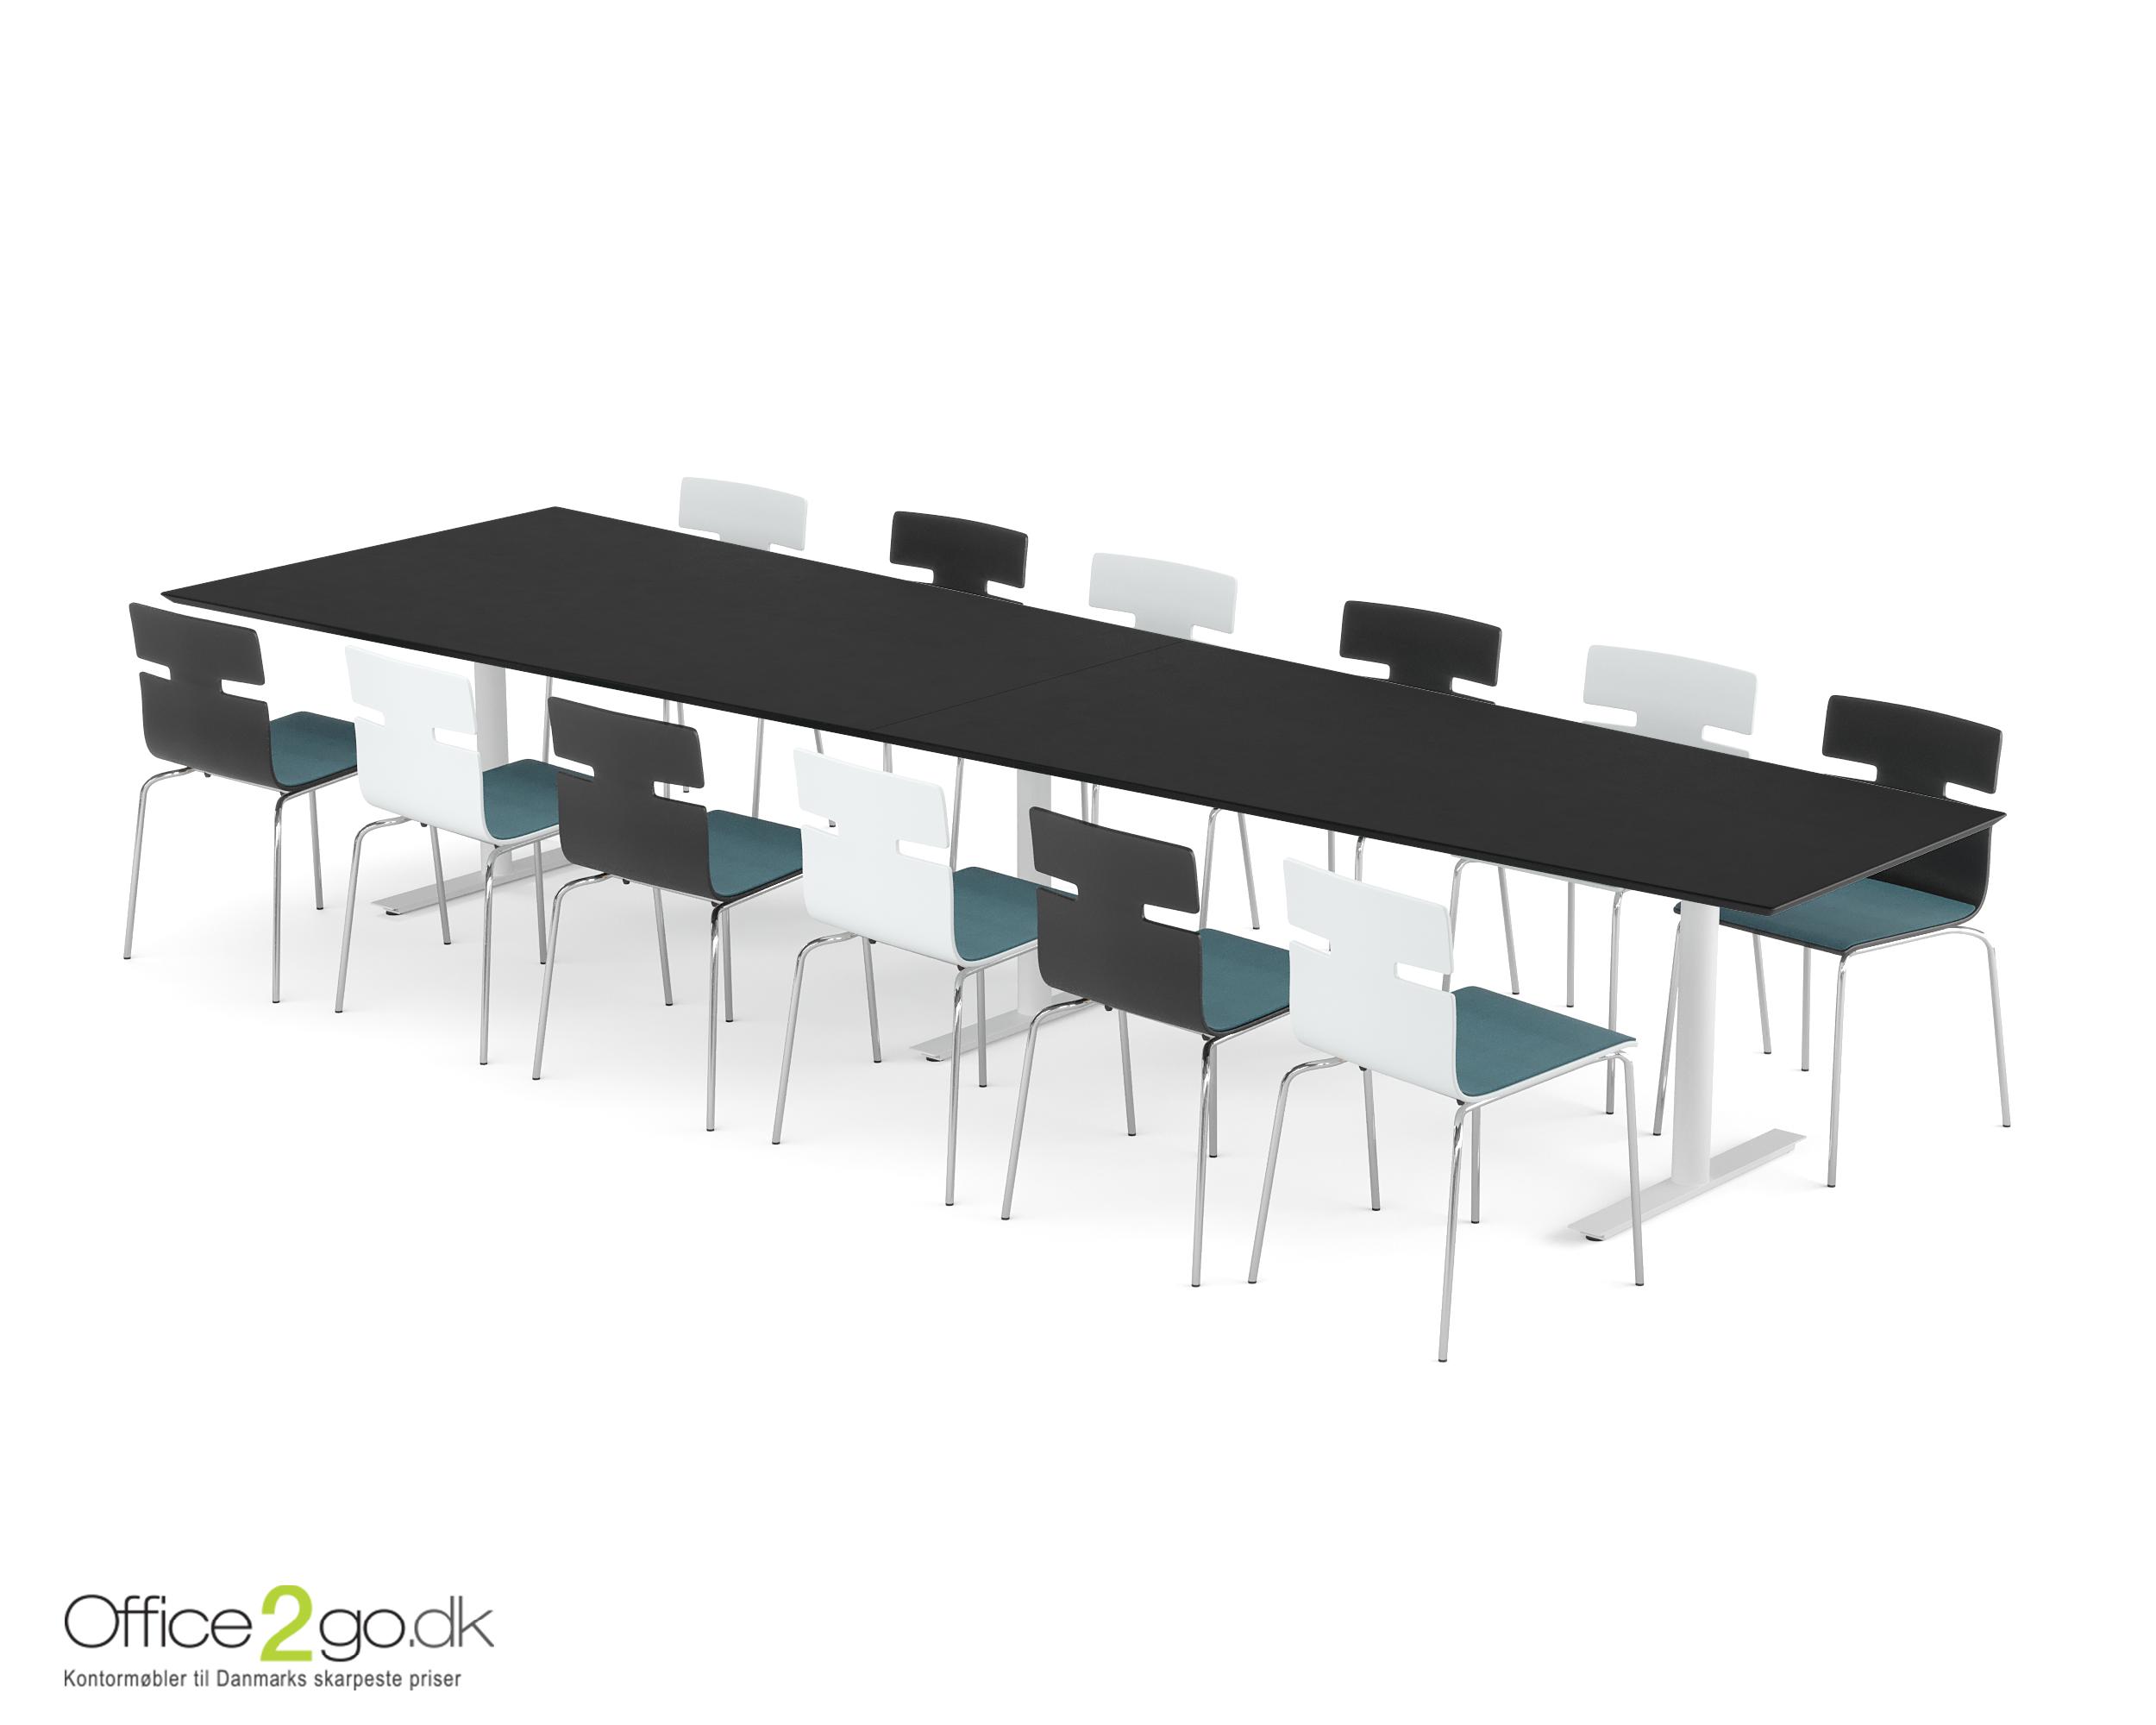 Inline Media mødebord - 12 personer - 400 cm.